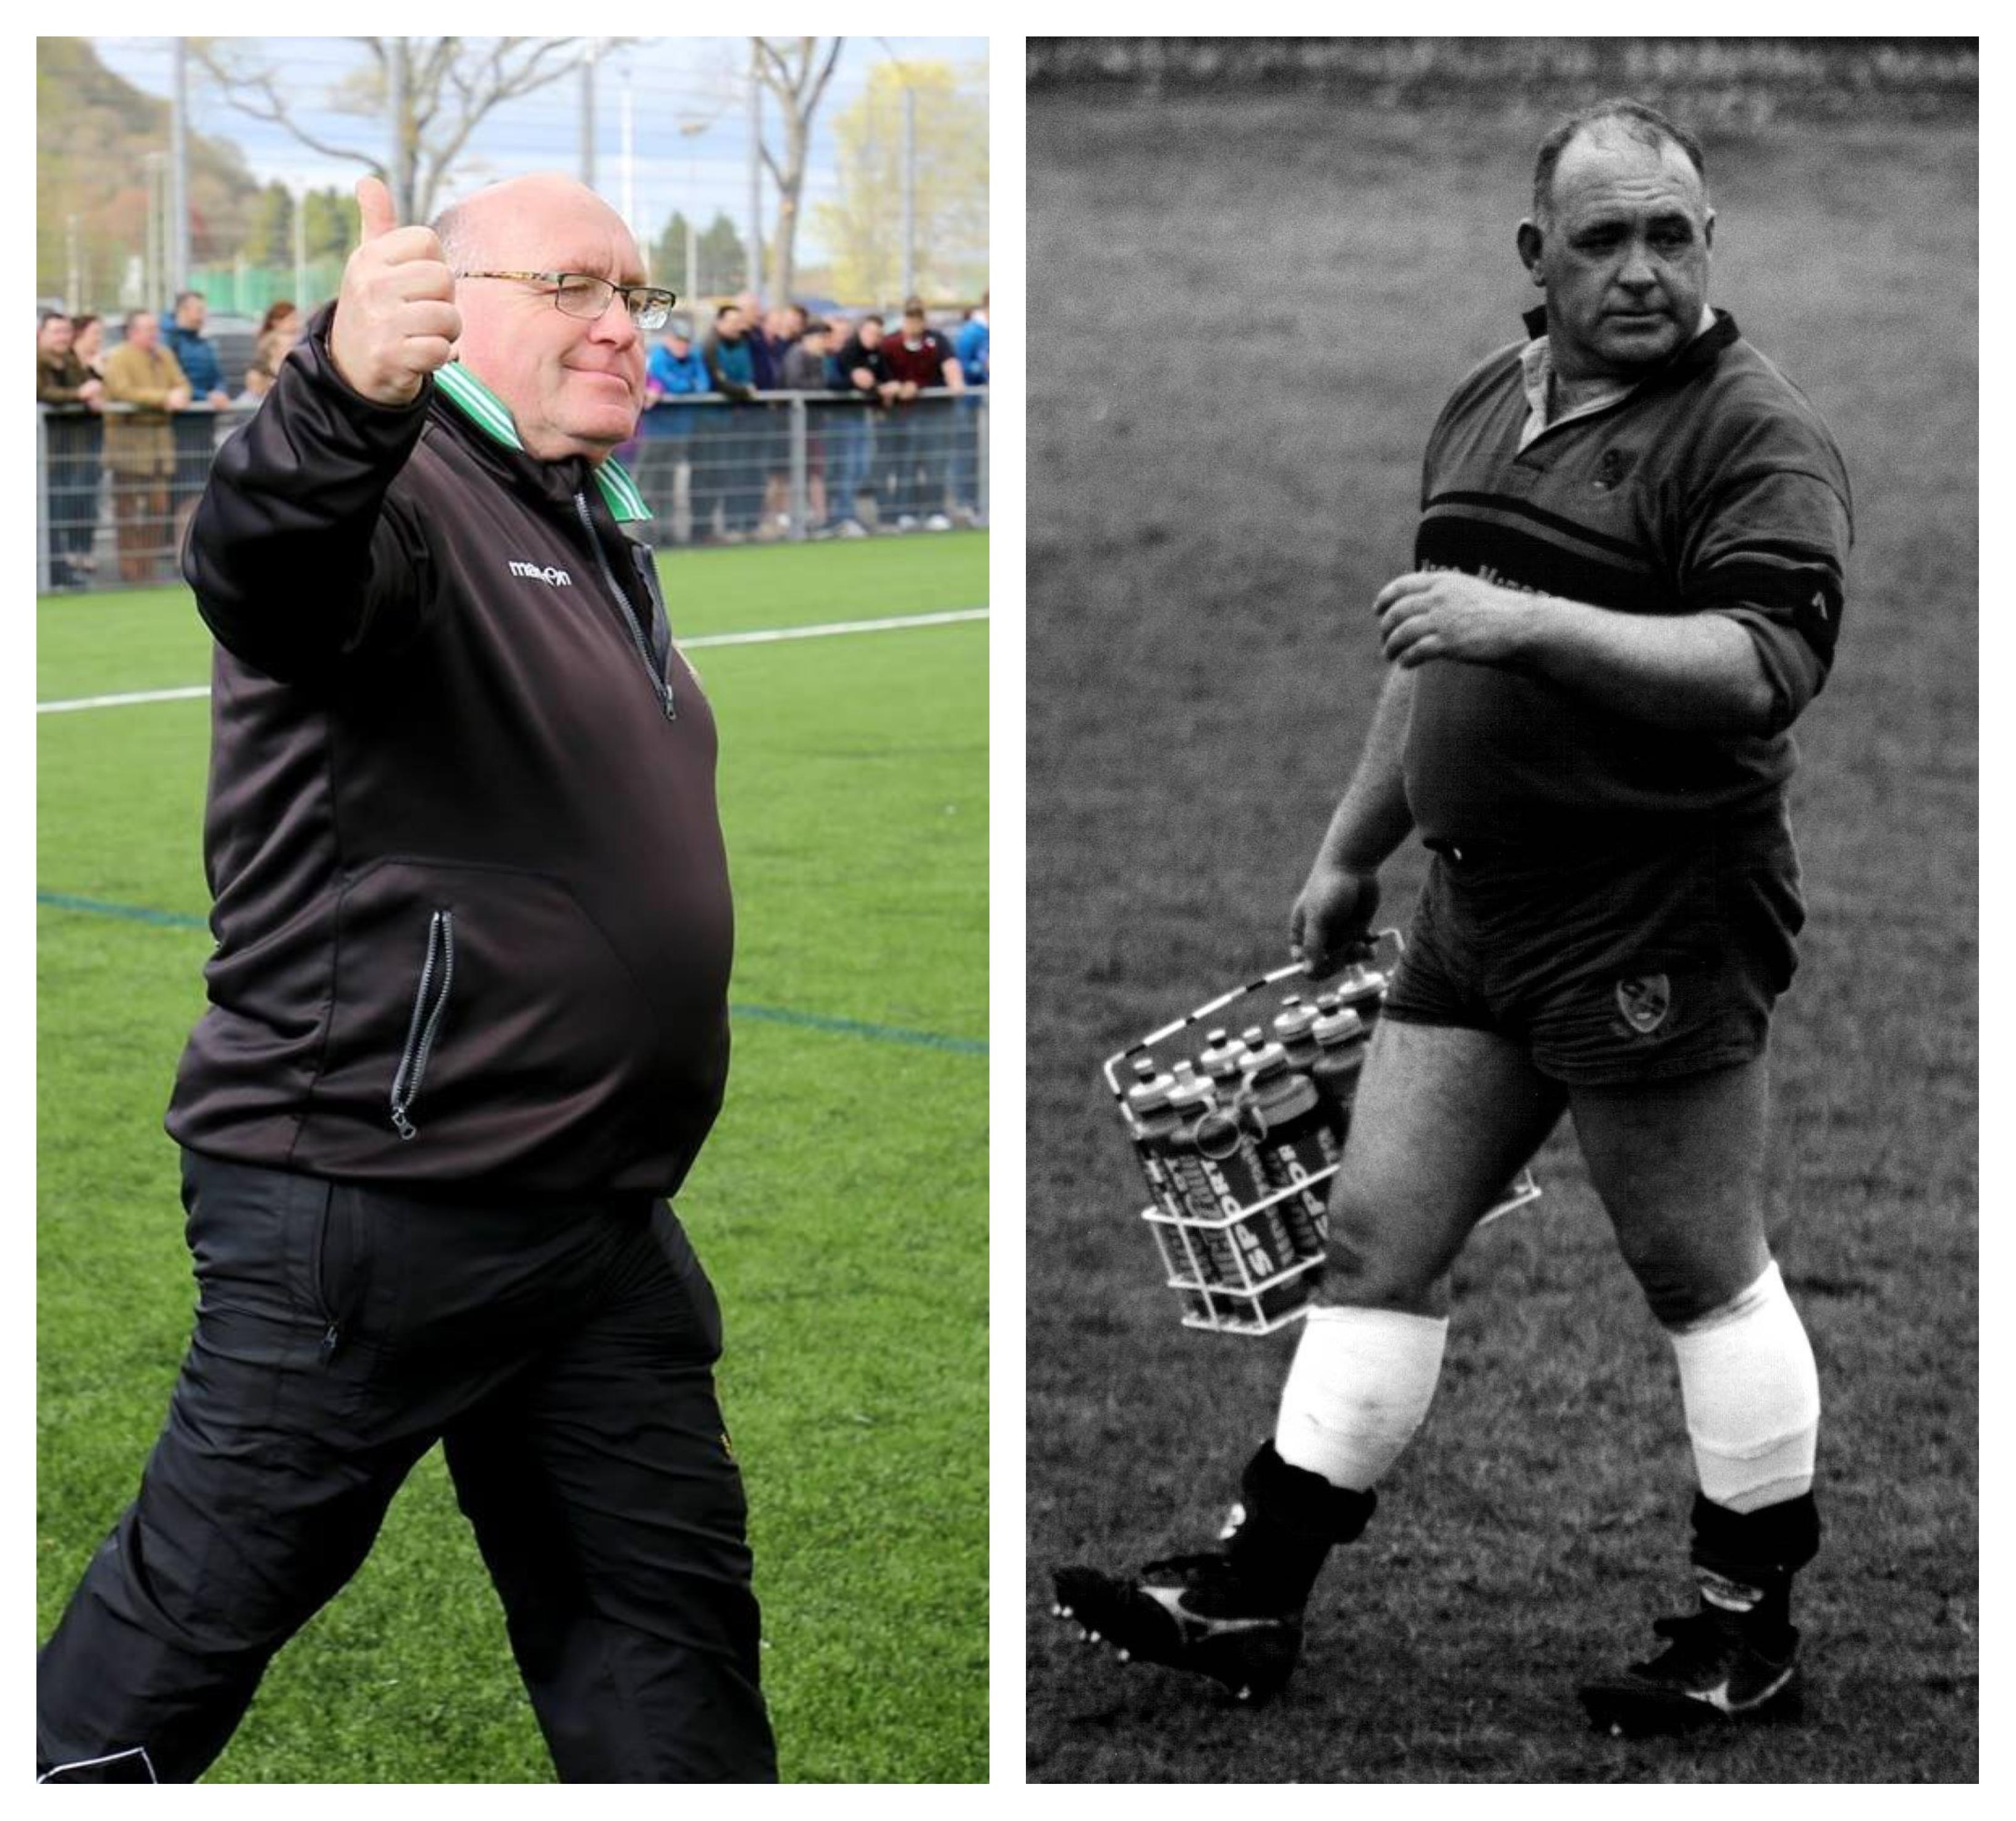 Highland stalwart Alister 'Porky' Wemyss who has passed aged 62